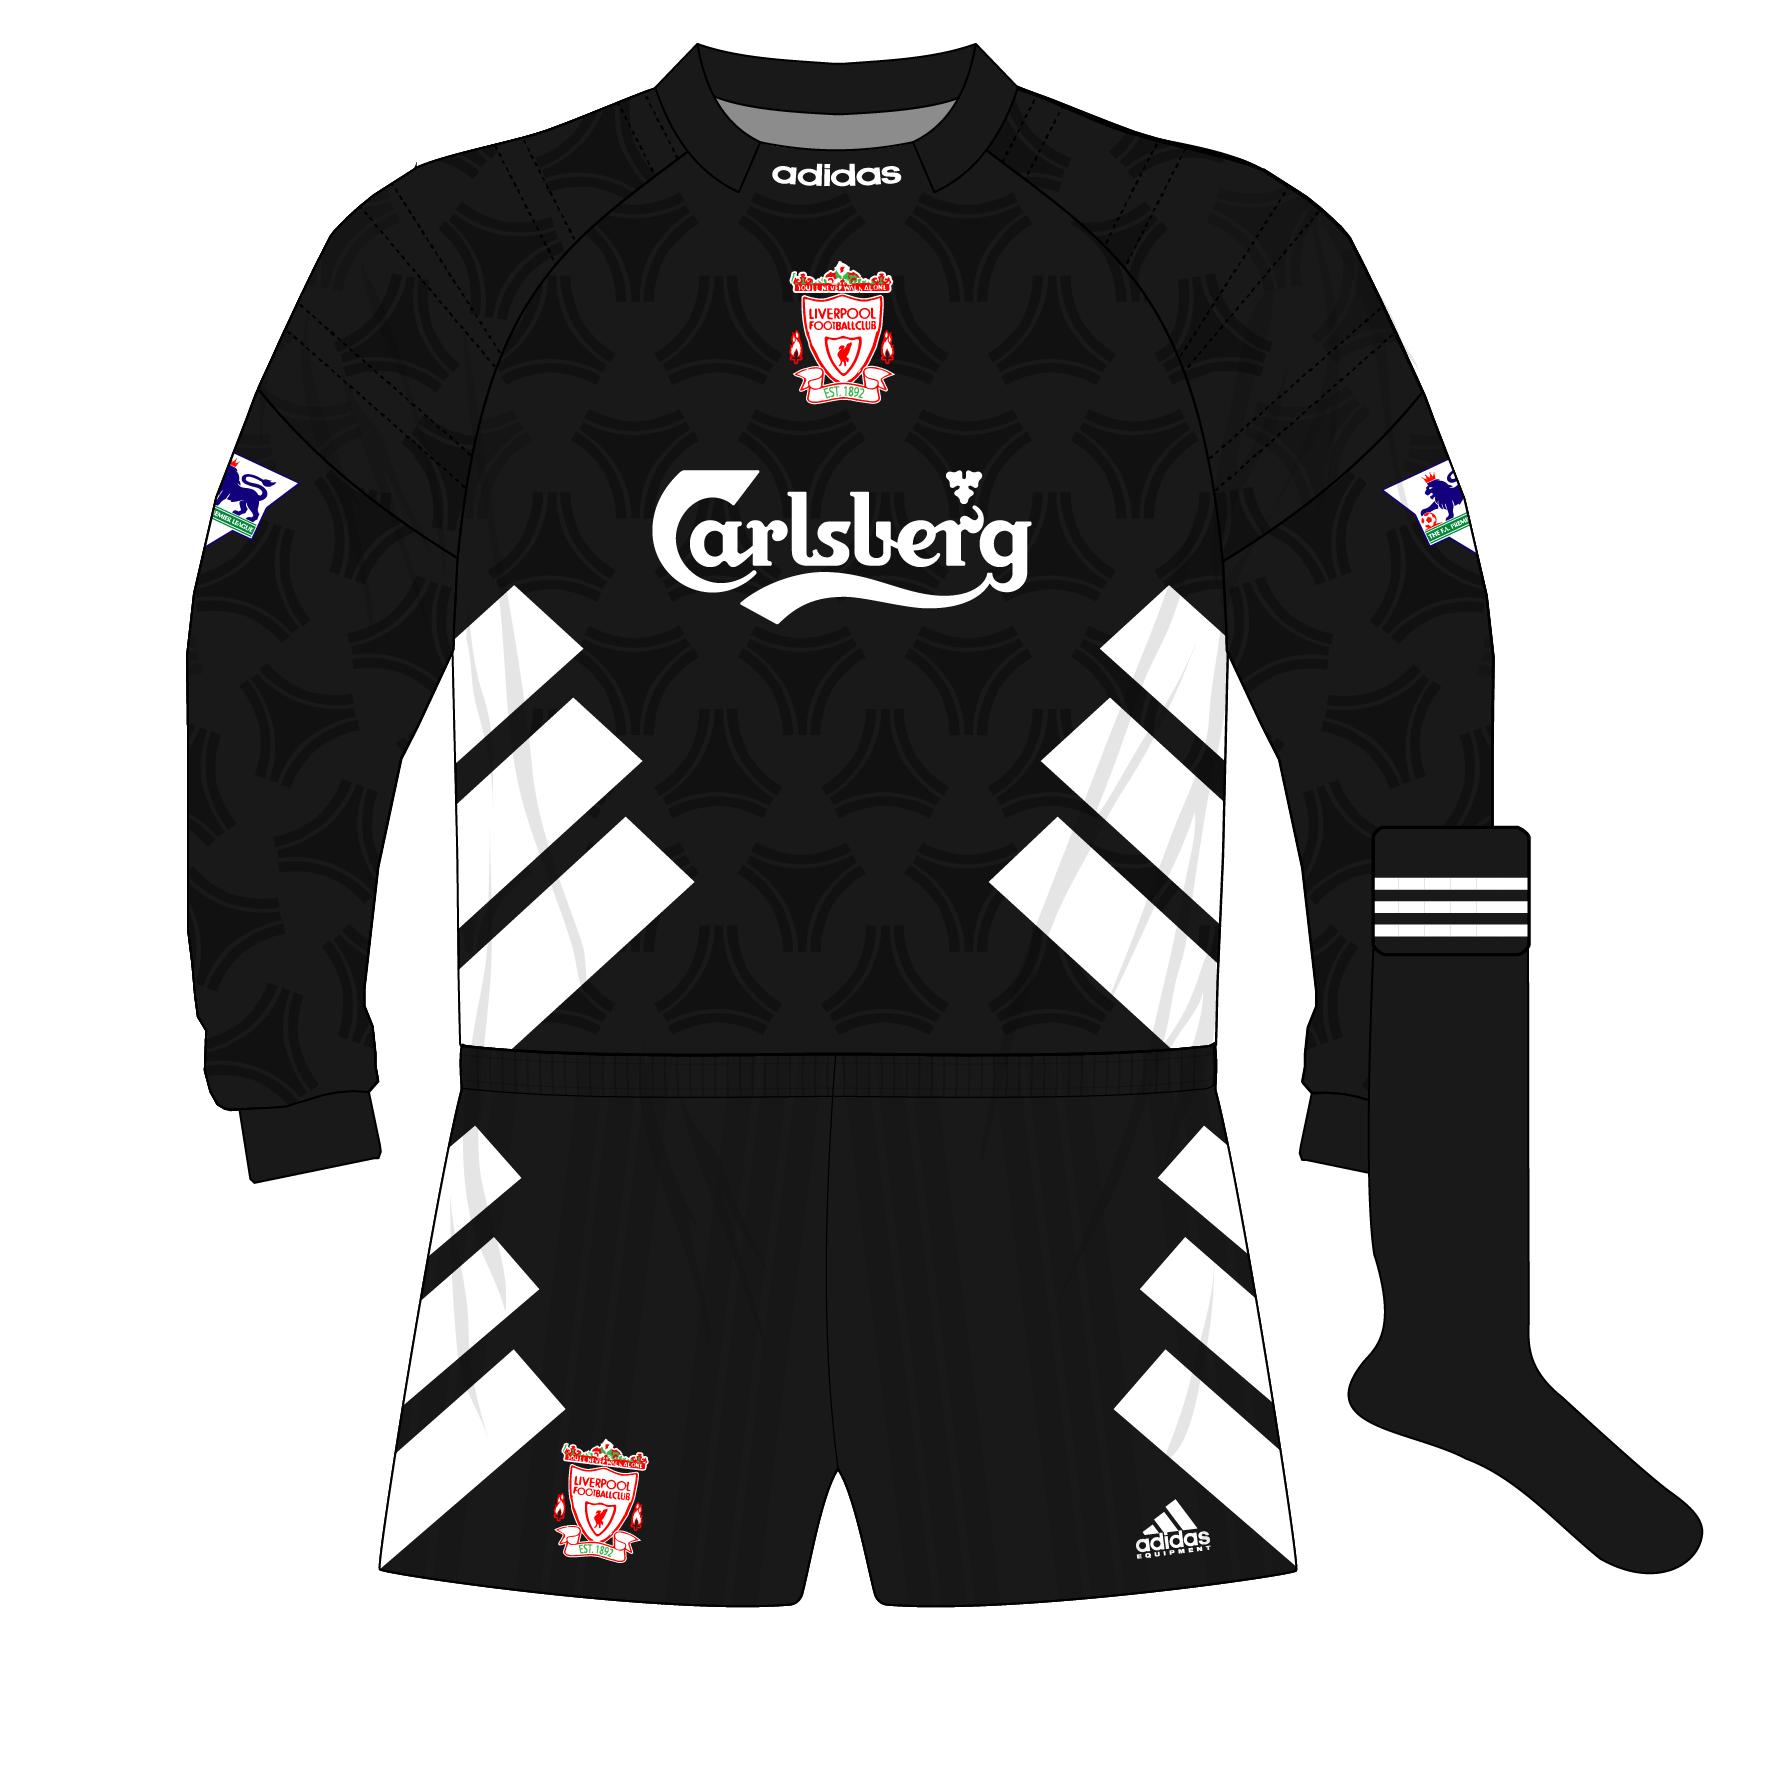 the latest 2ffa5 8397c Liverpool-1993-1994-home-goalkeeper-shirt-black-adidas ...